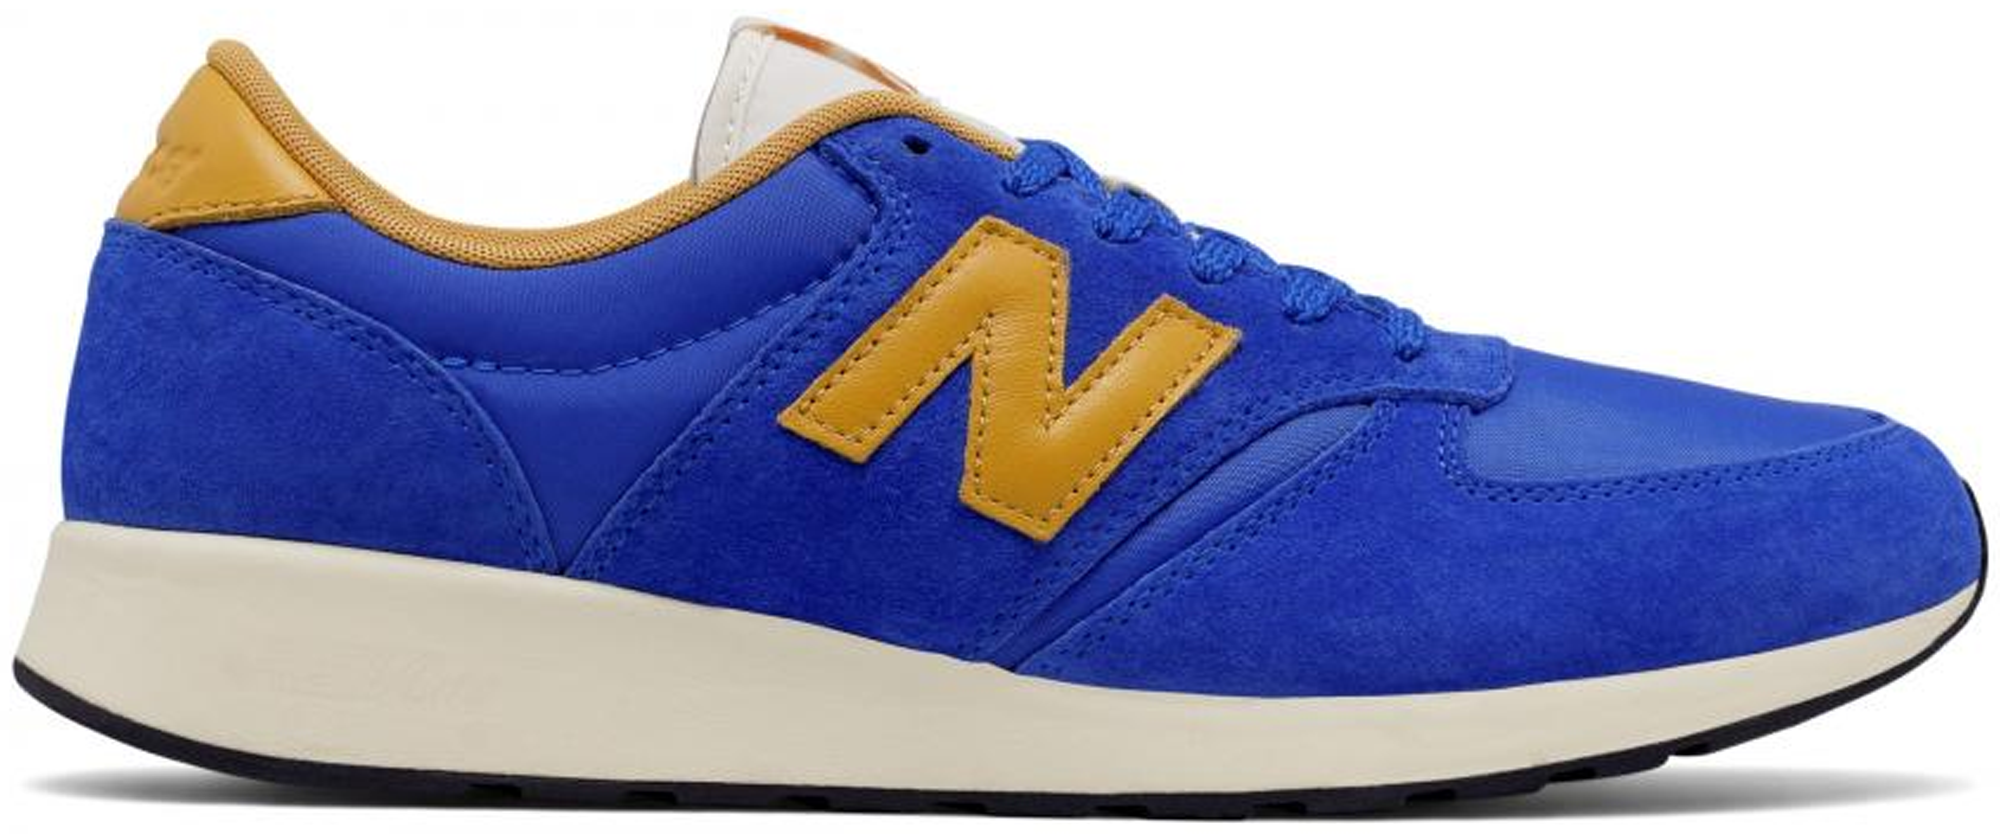 8f248e2c9180 ... real new balance 420 blue tan 01ee4 0652b